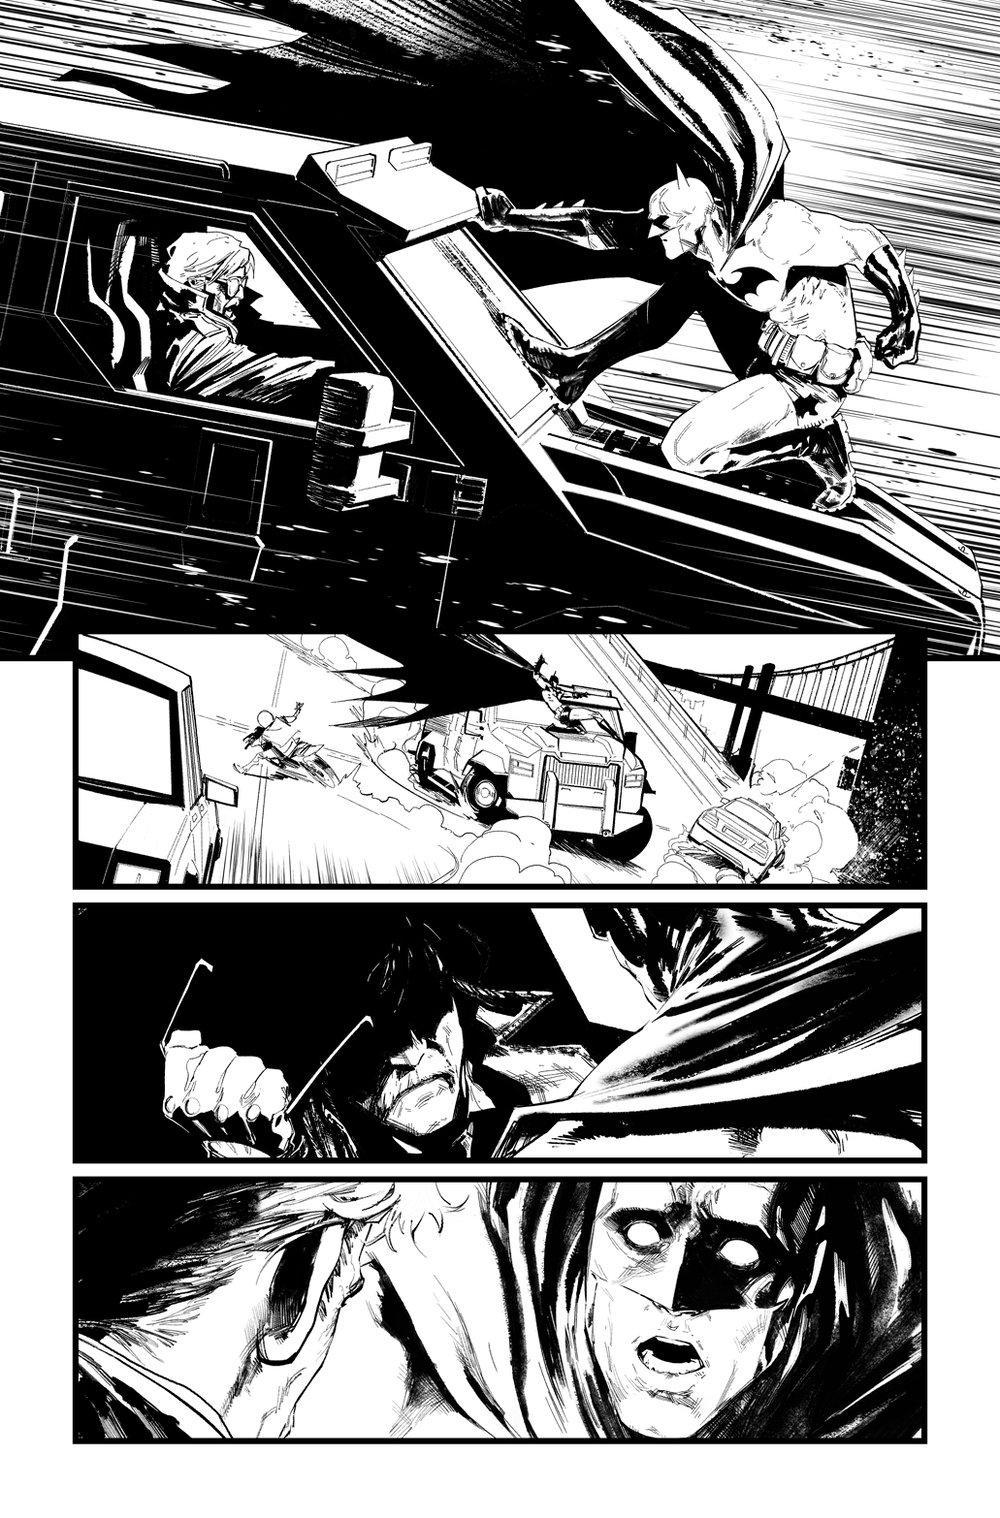 Image of BATMAN/SUPERMAN #3 p.10 ARTIST'S PROOF